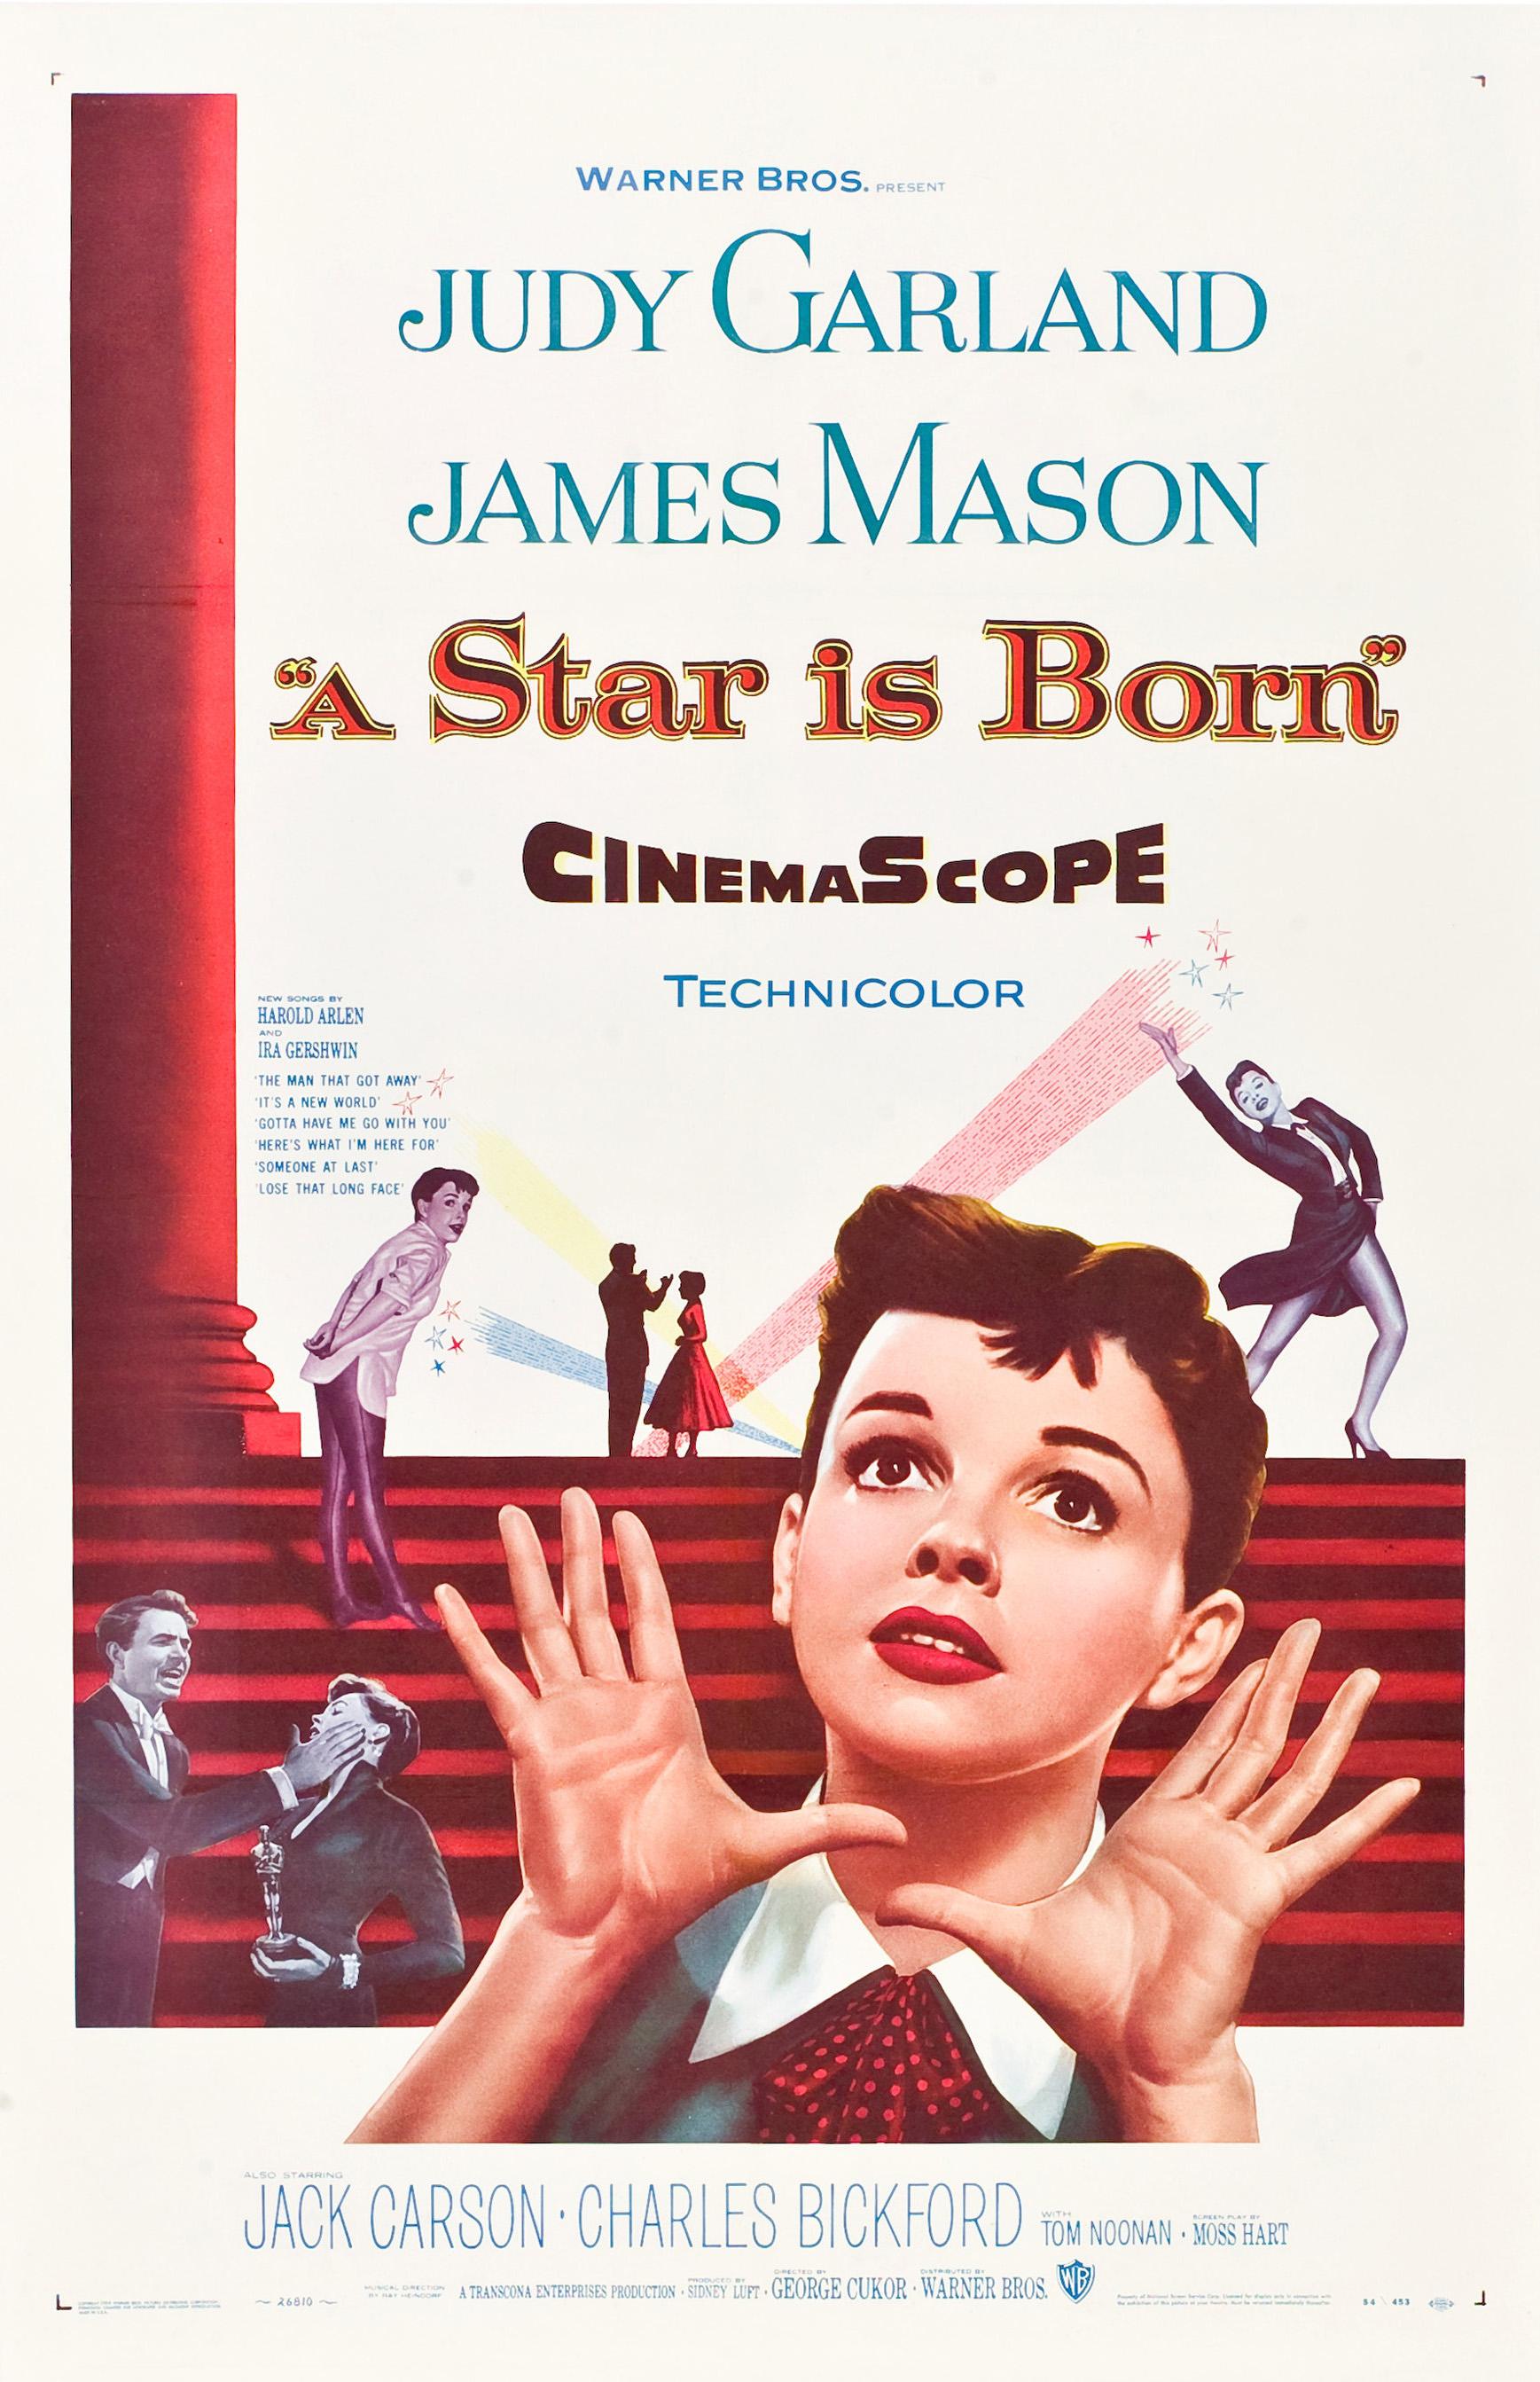 A Star Is Born (1954 film)